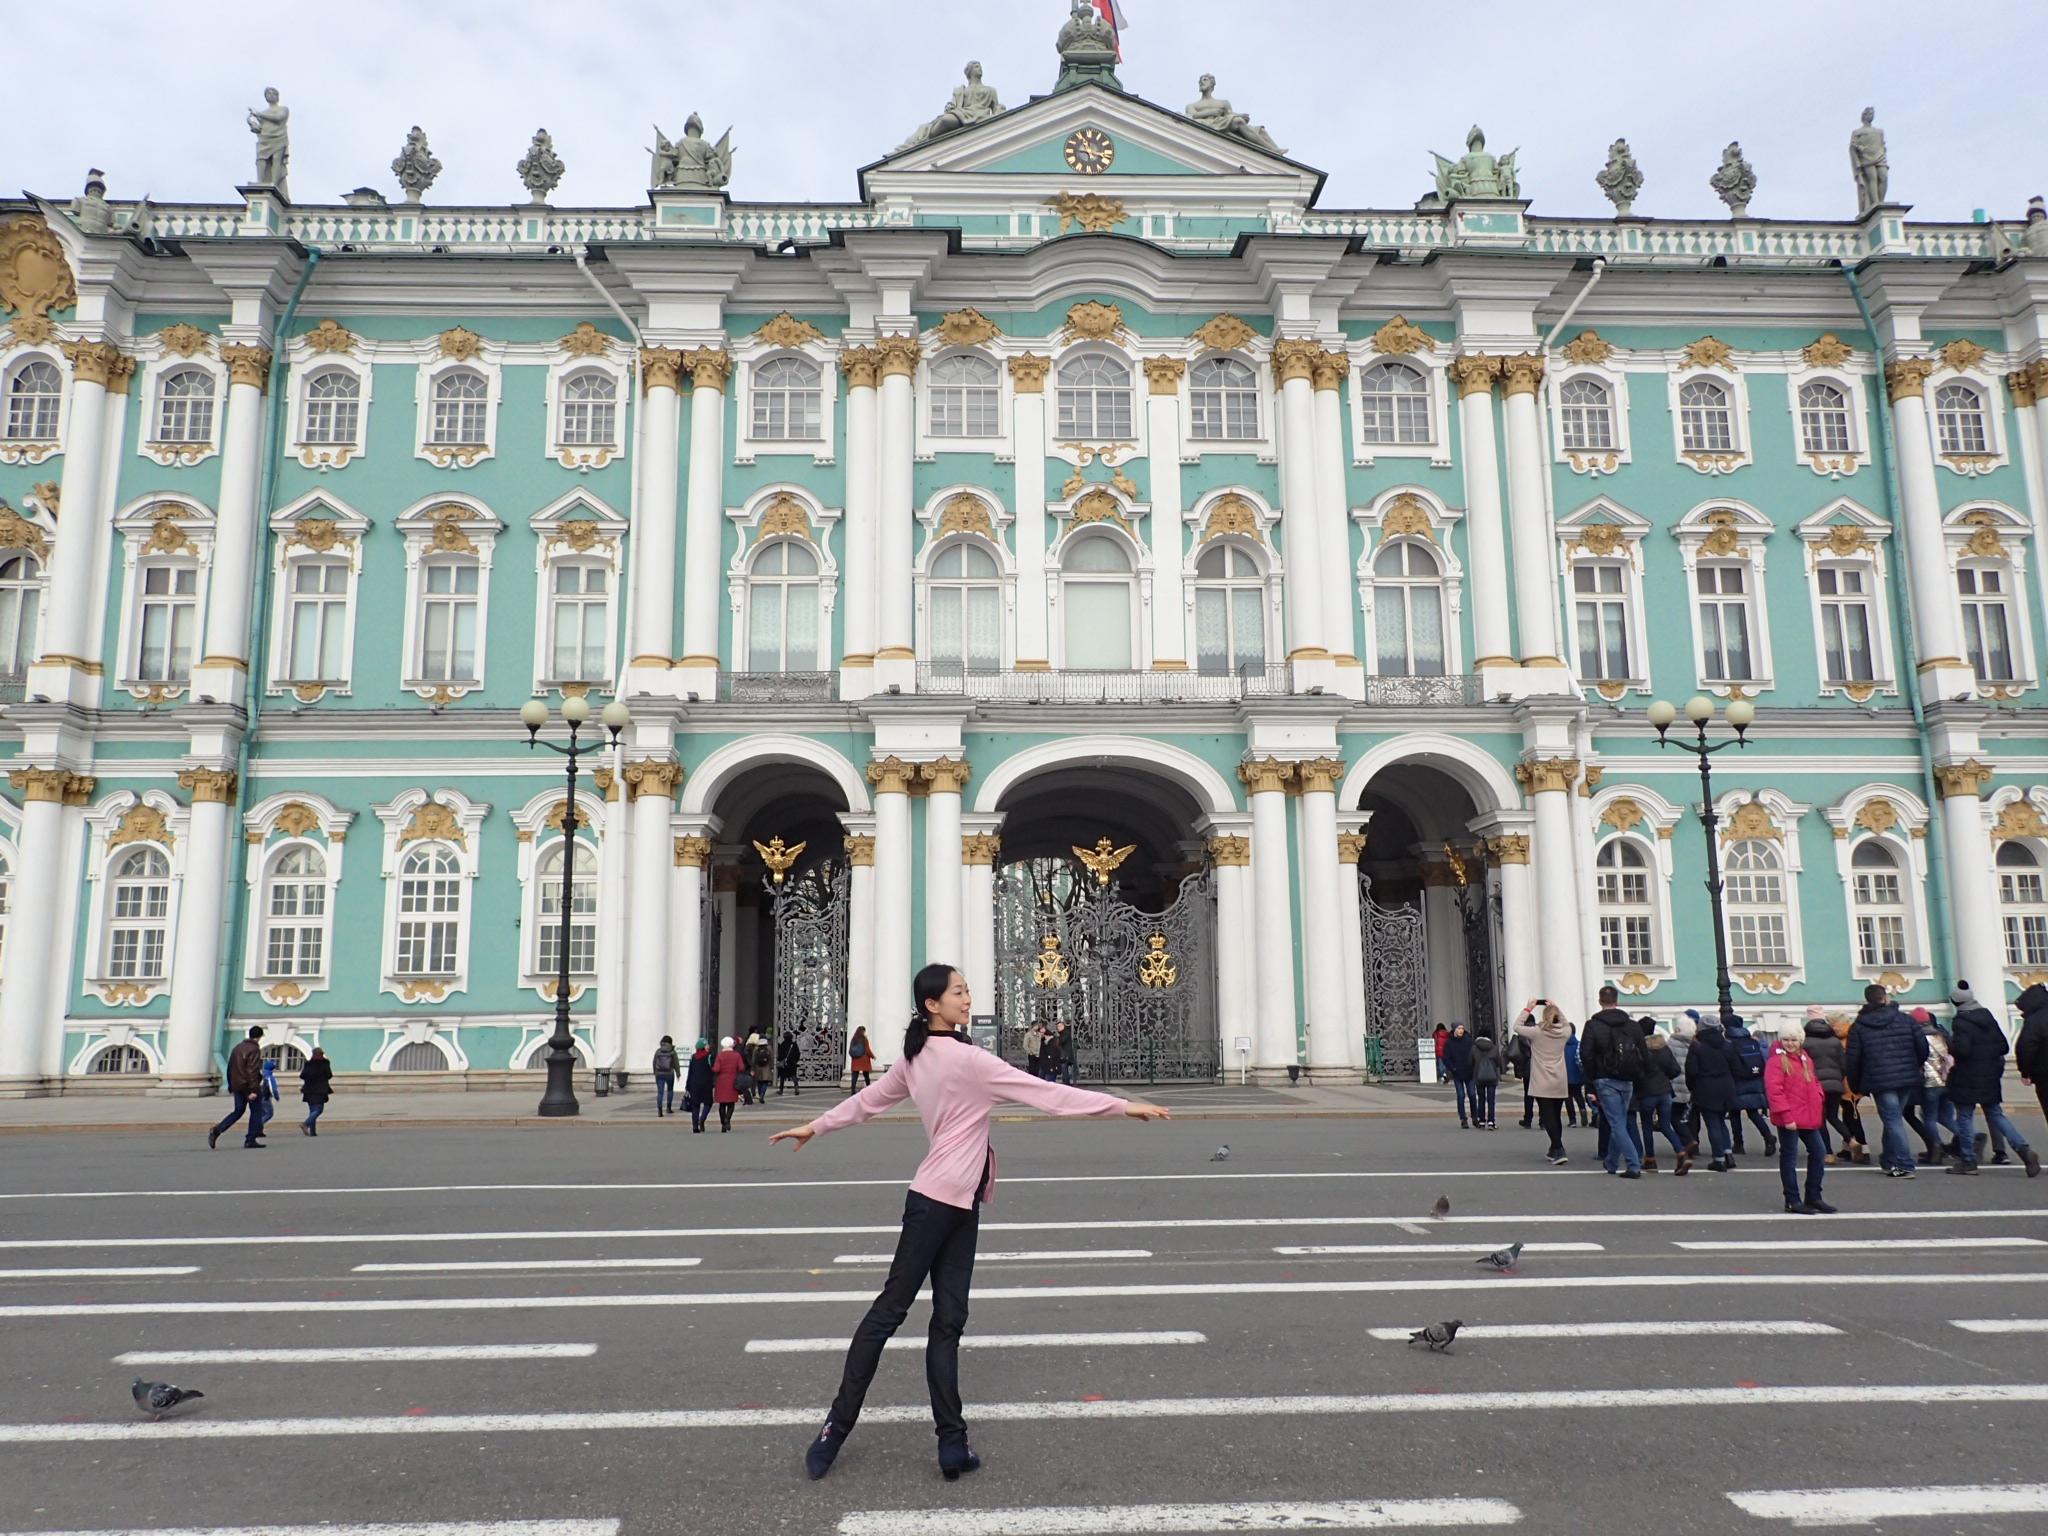 St. Petertsburg